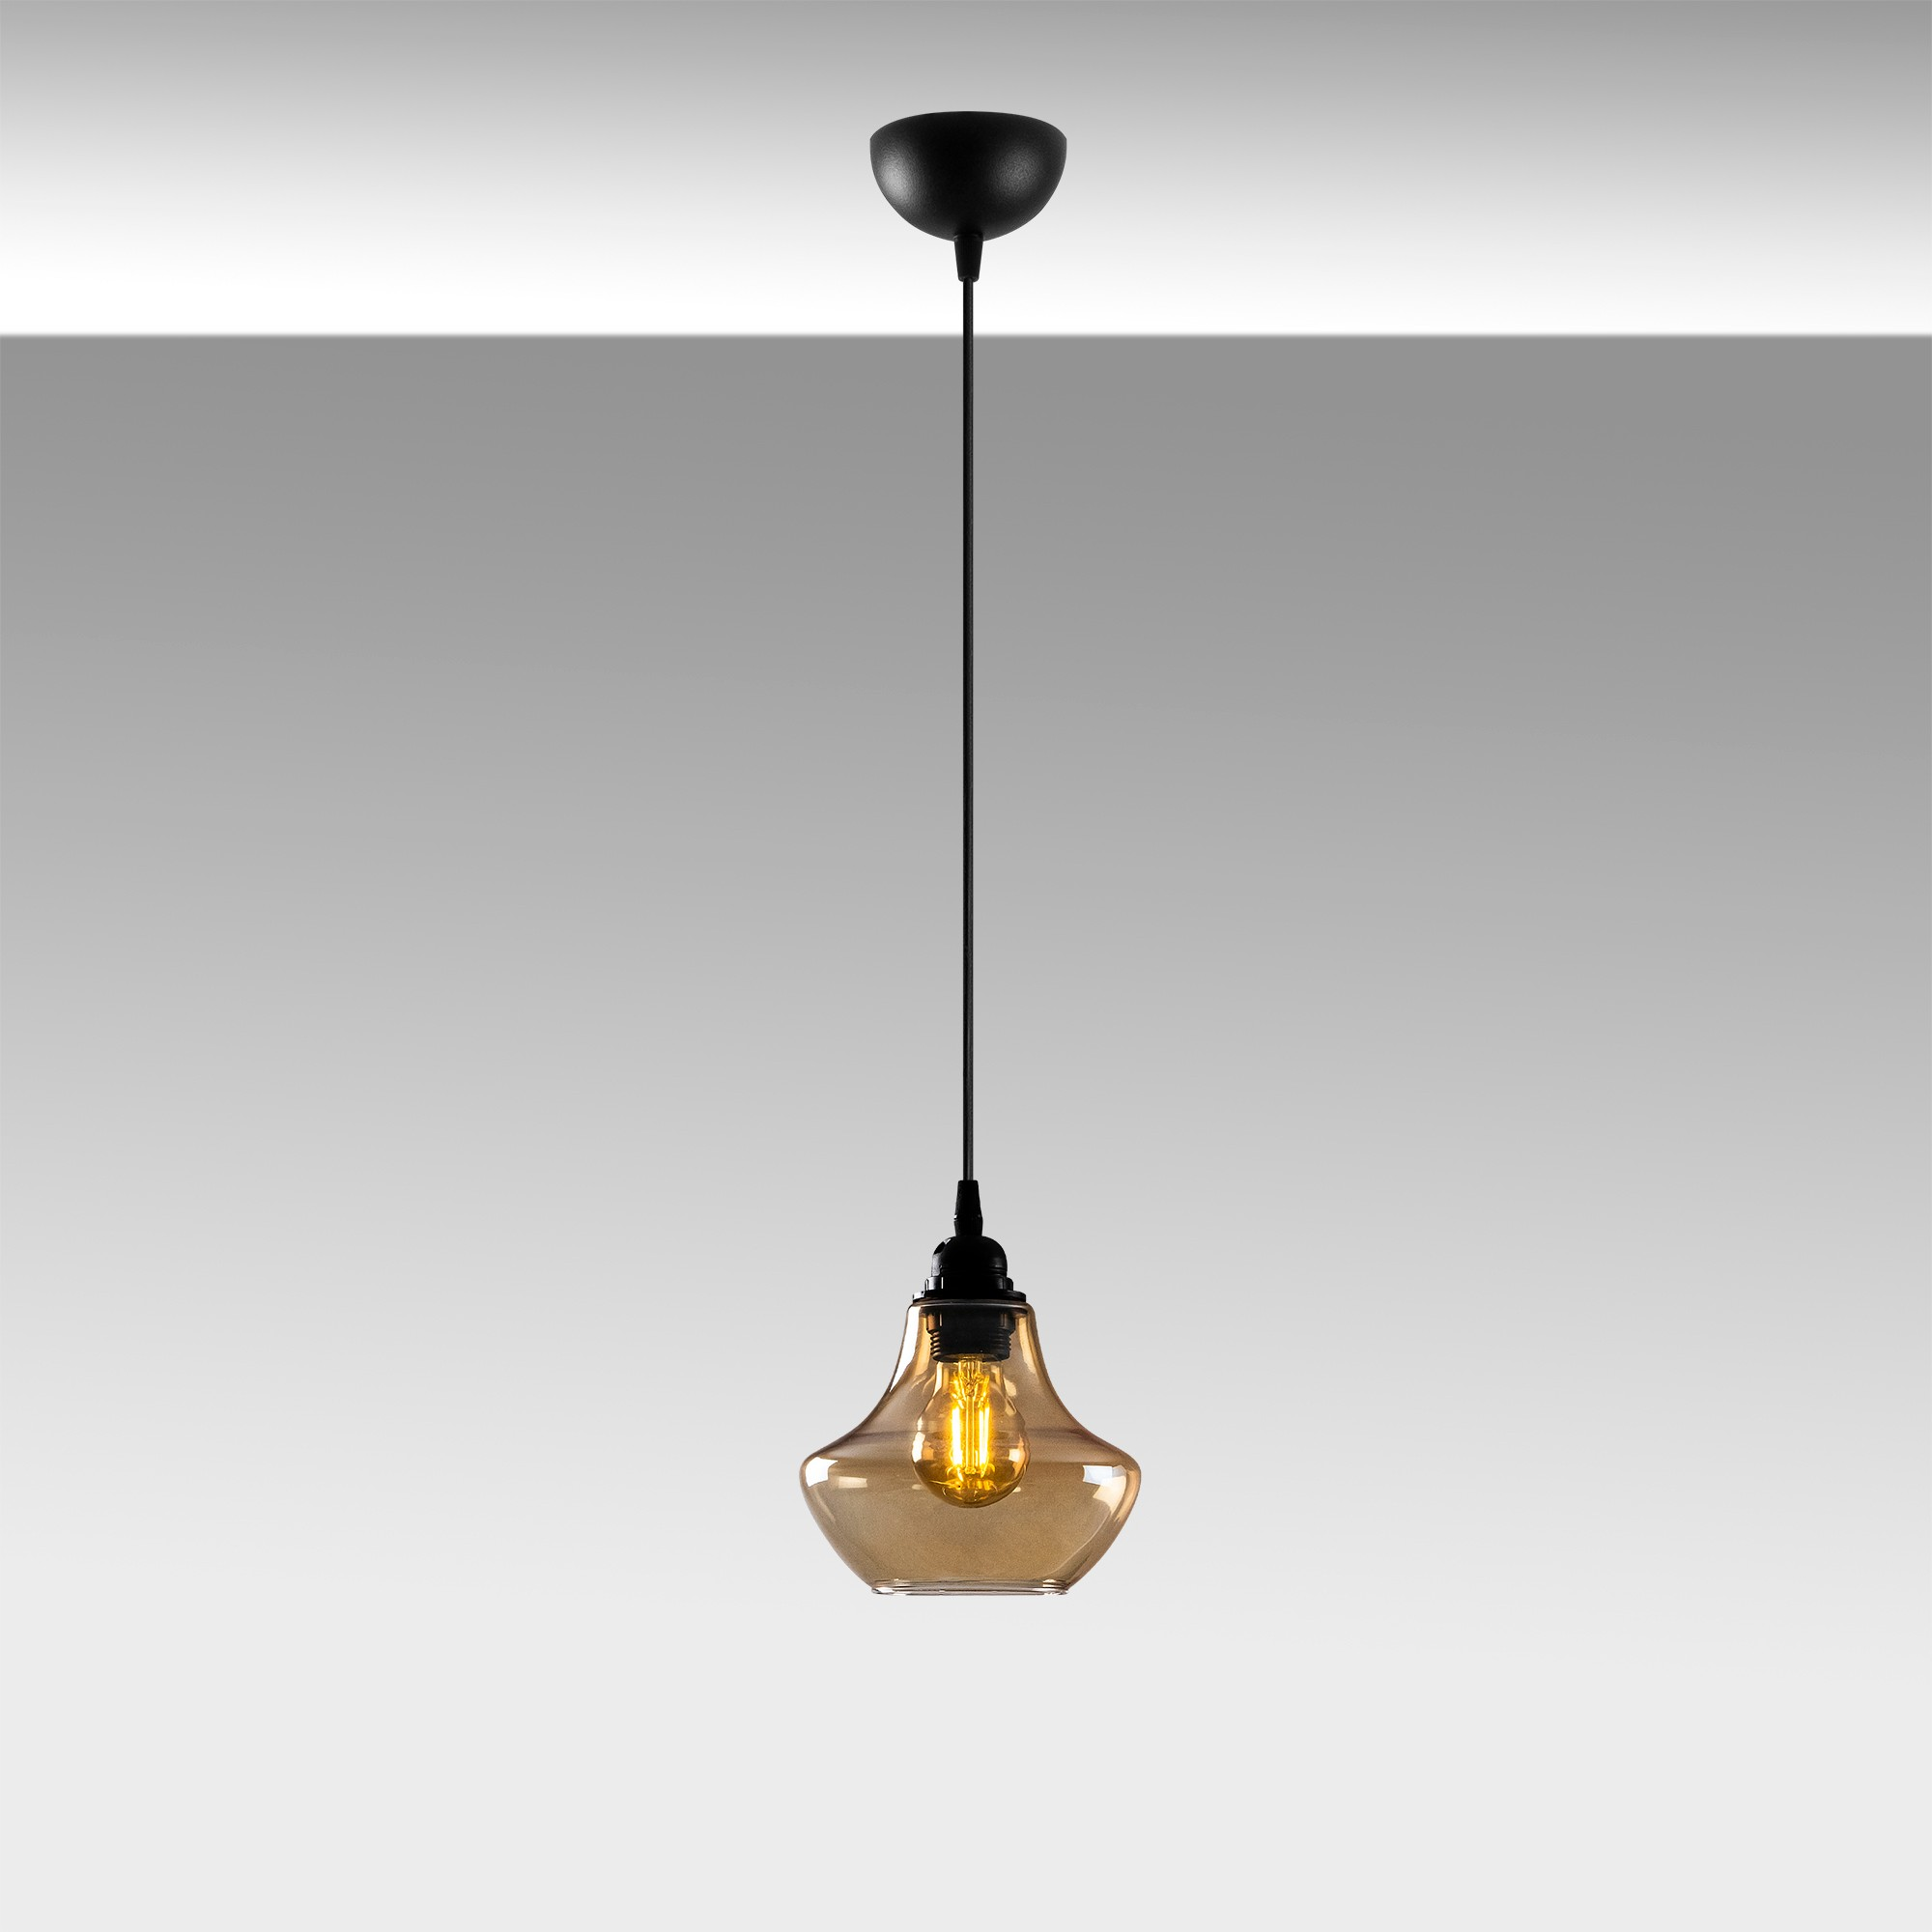 gouden hanglamp e27 fitting-Moroni - sfeerfoto